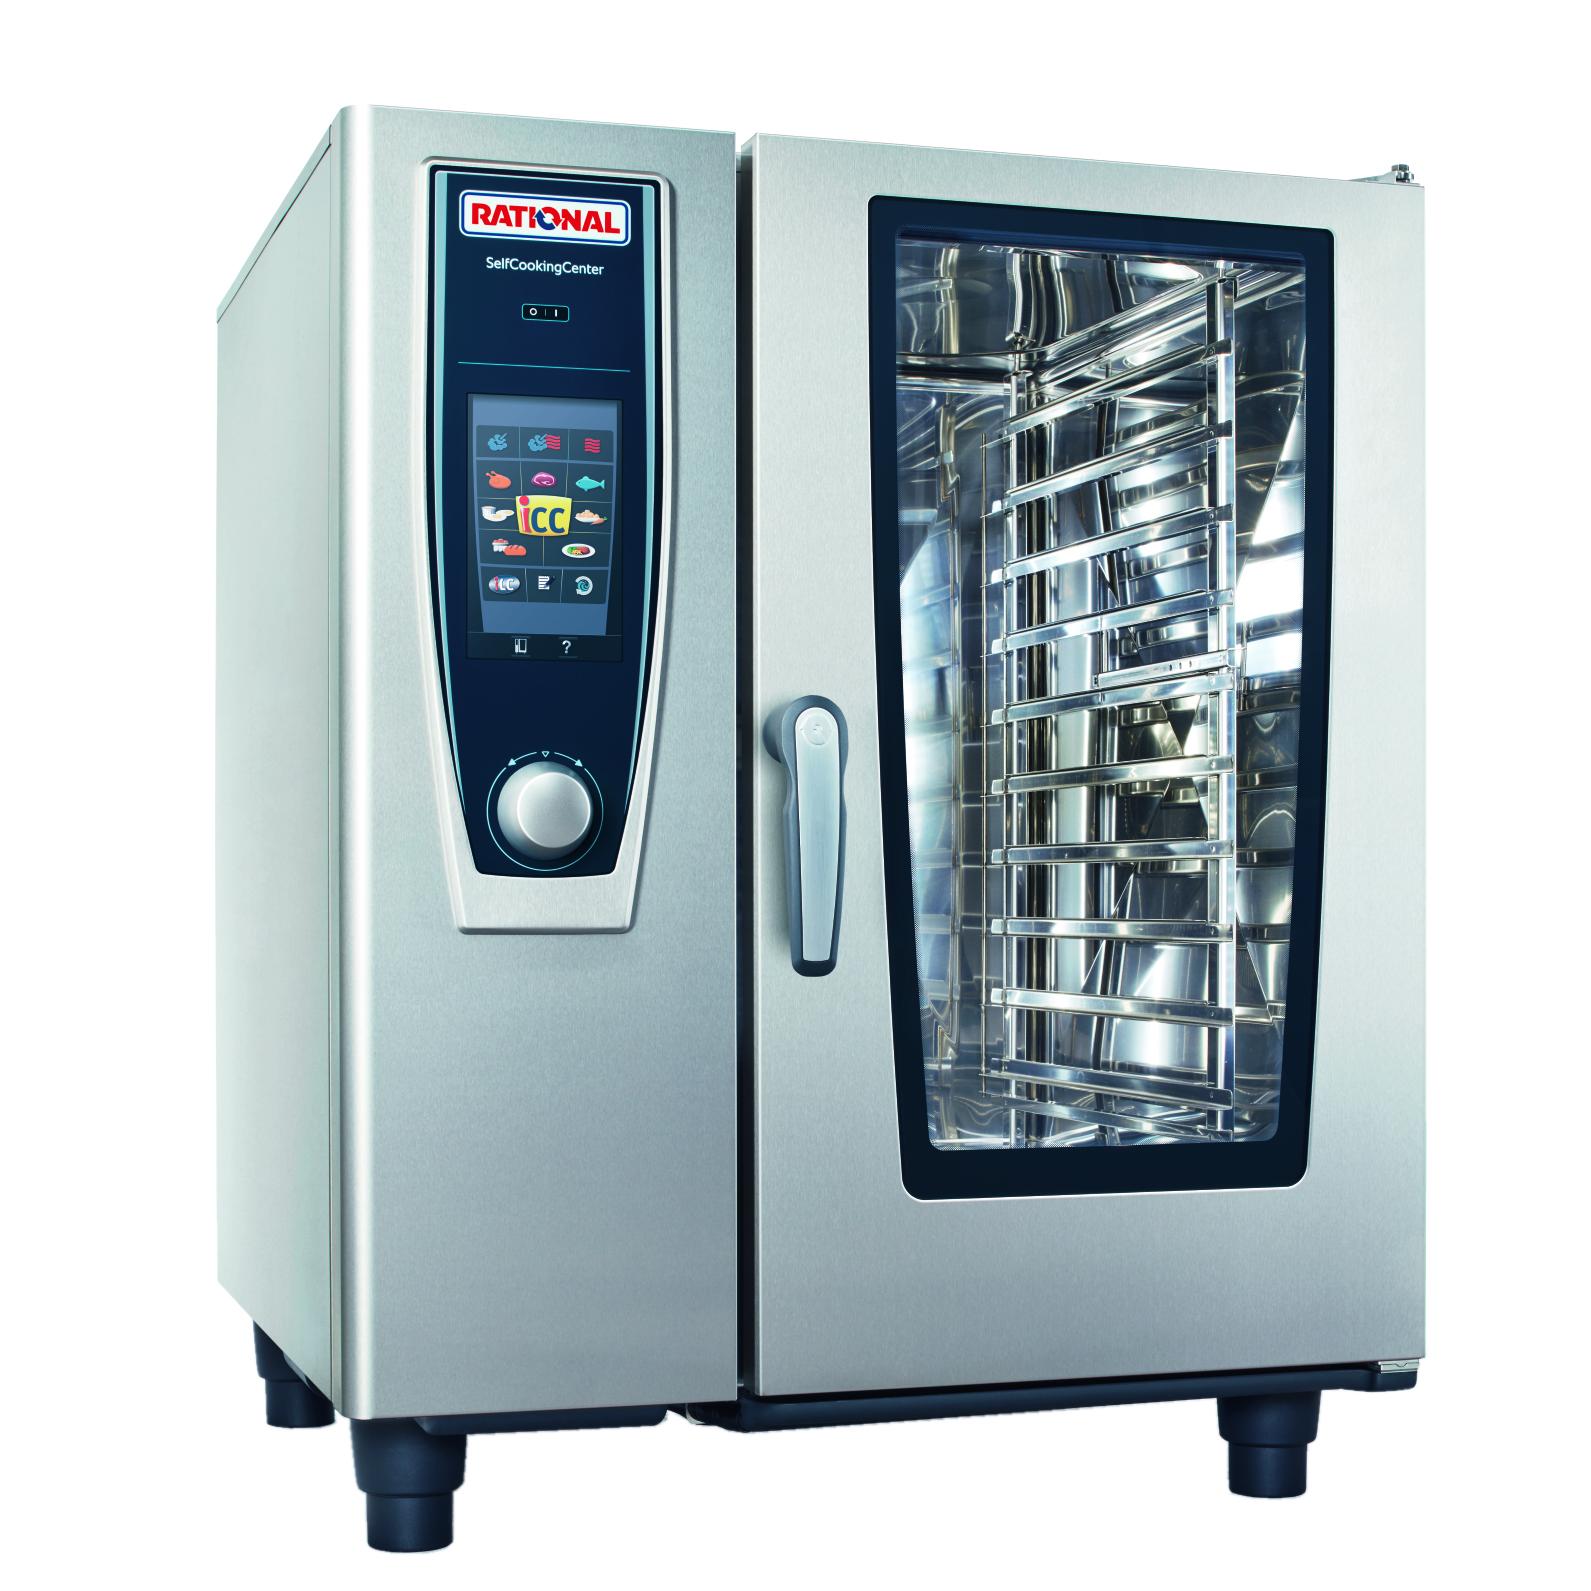 RATIONAL B118206.19D combi oven, gas